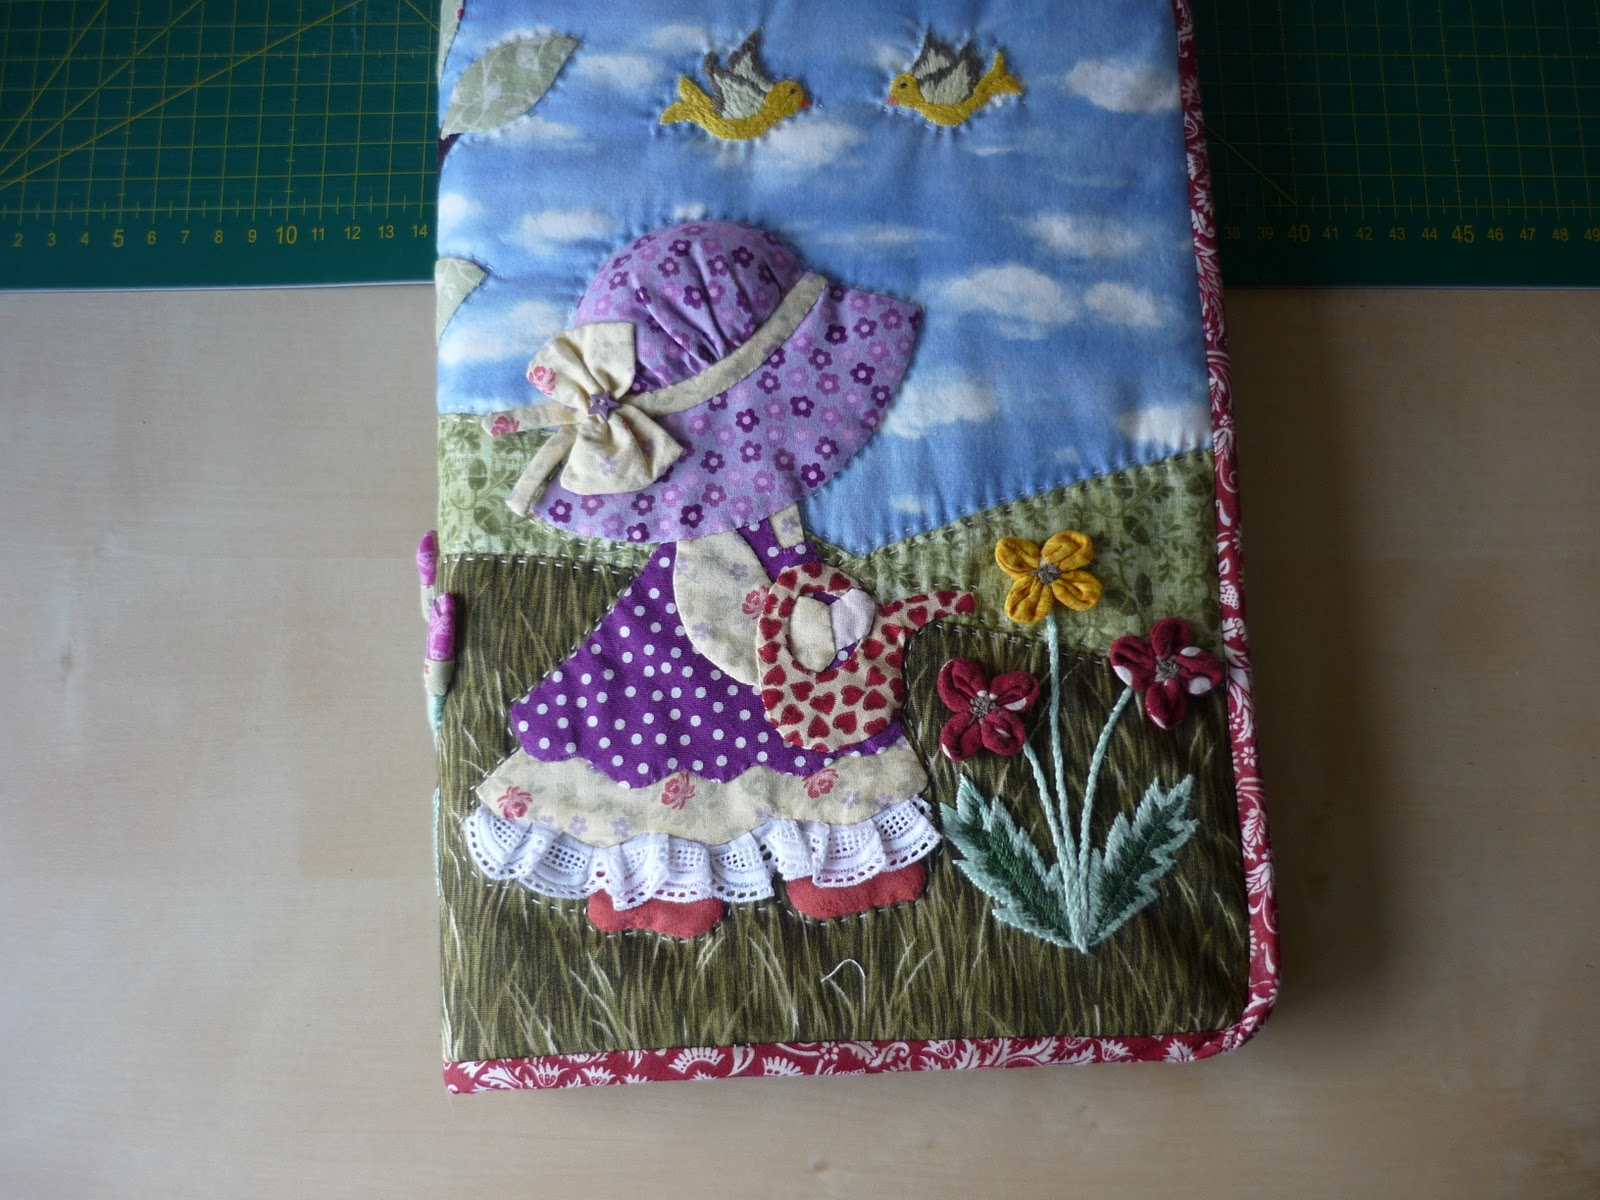 Coser y coser patchwork agenda sunbonnet sue for Como hacer patchwork